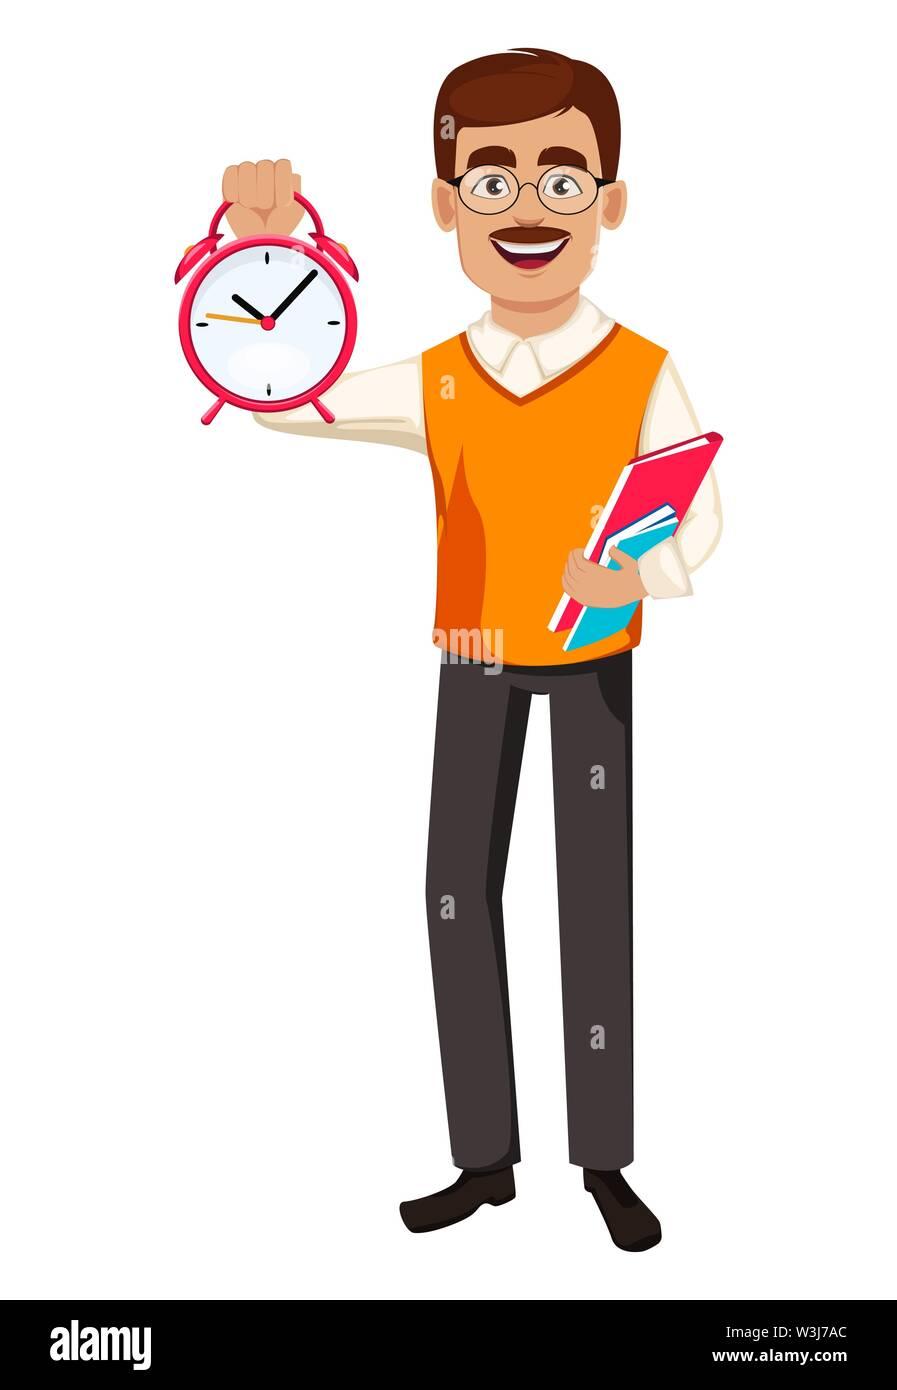 Back to school. Teacher man cartoon character holds books and alarm clock. Teacher's day. Vector illustration - Stock Image